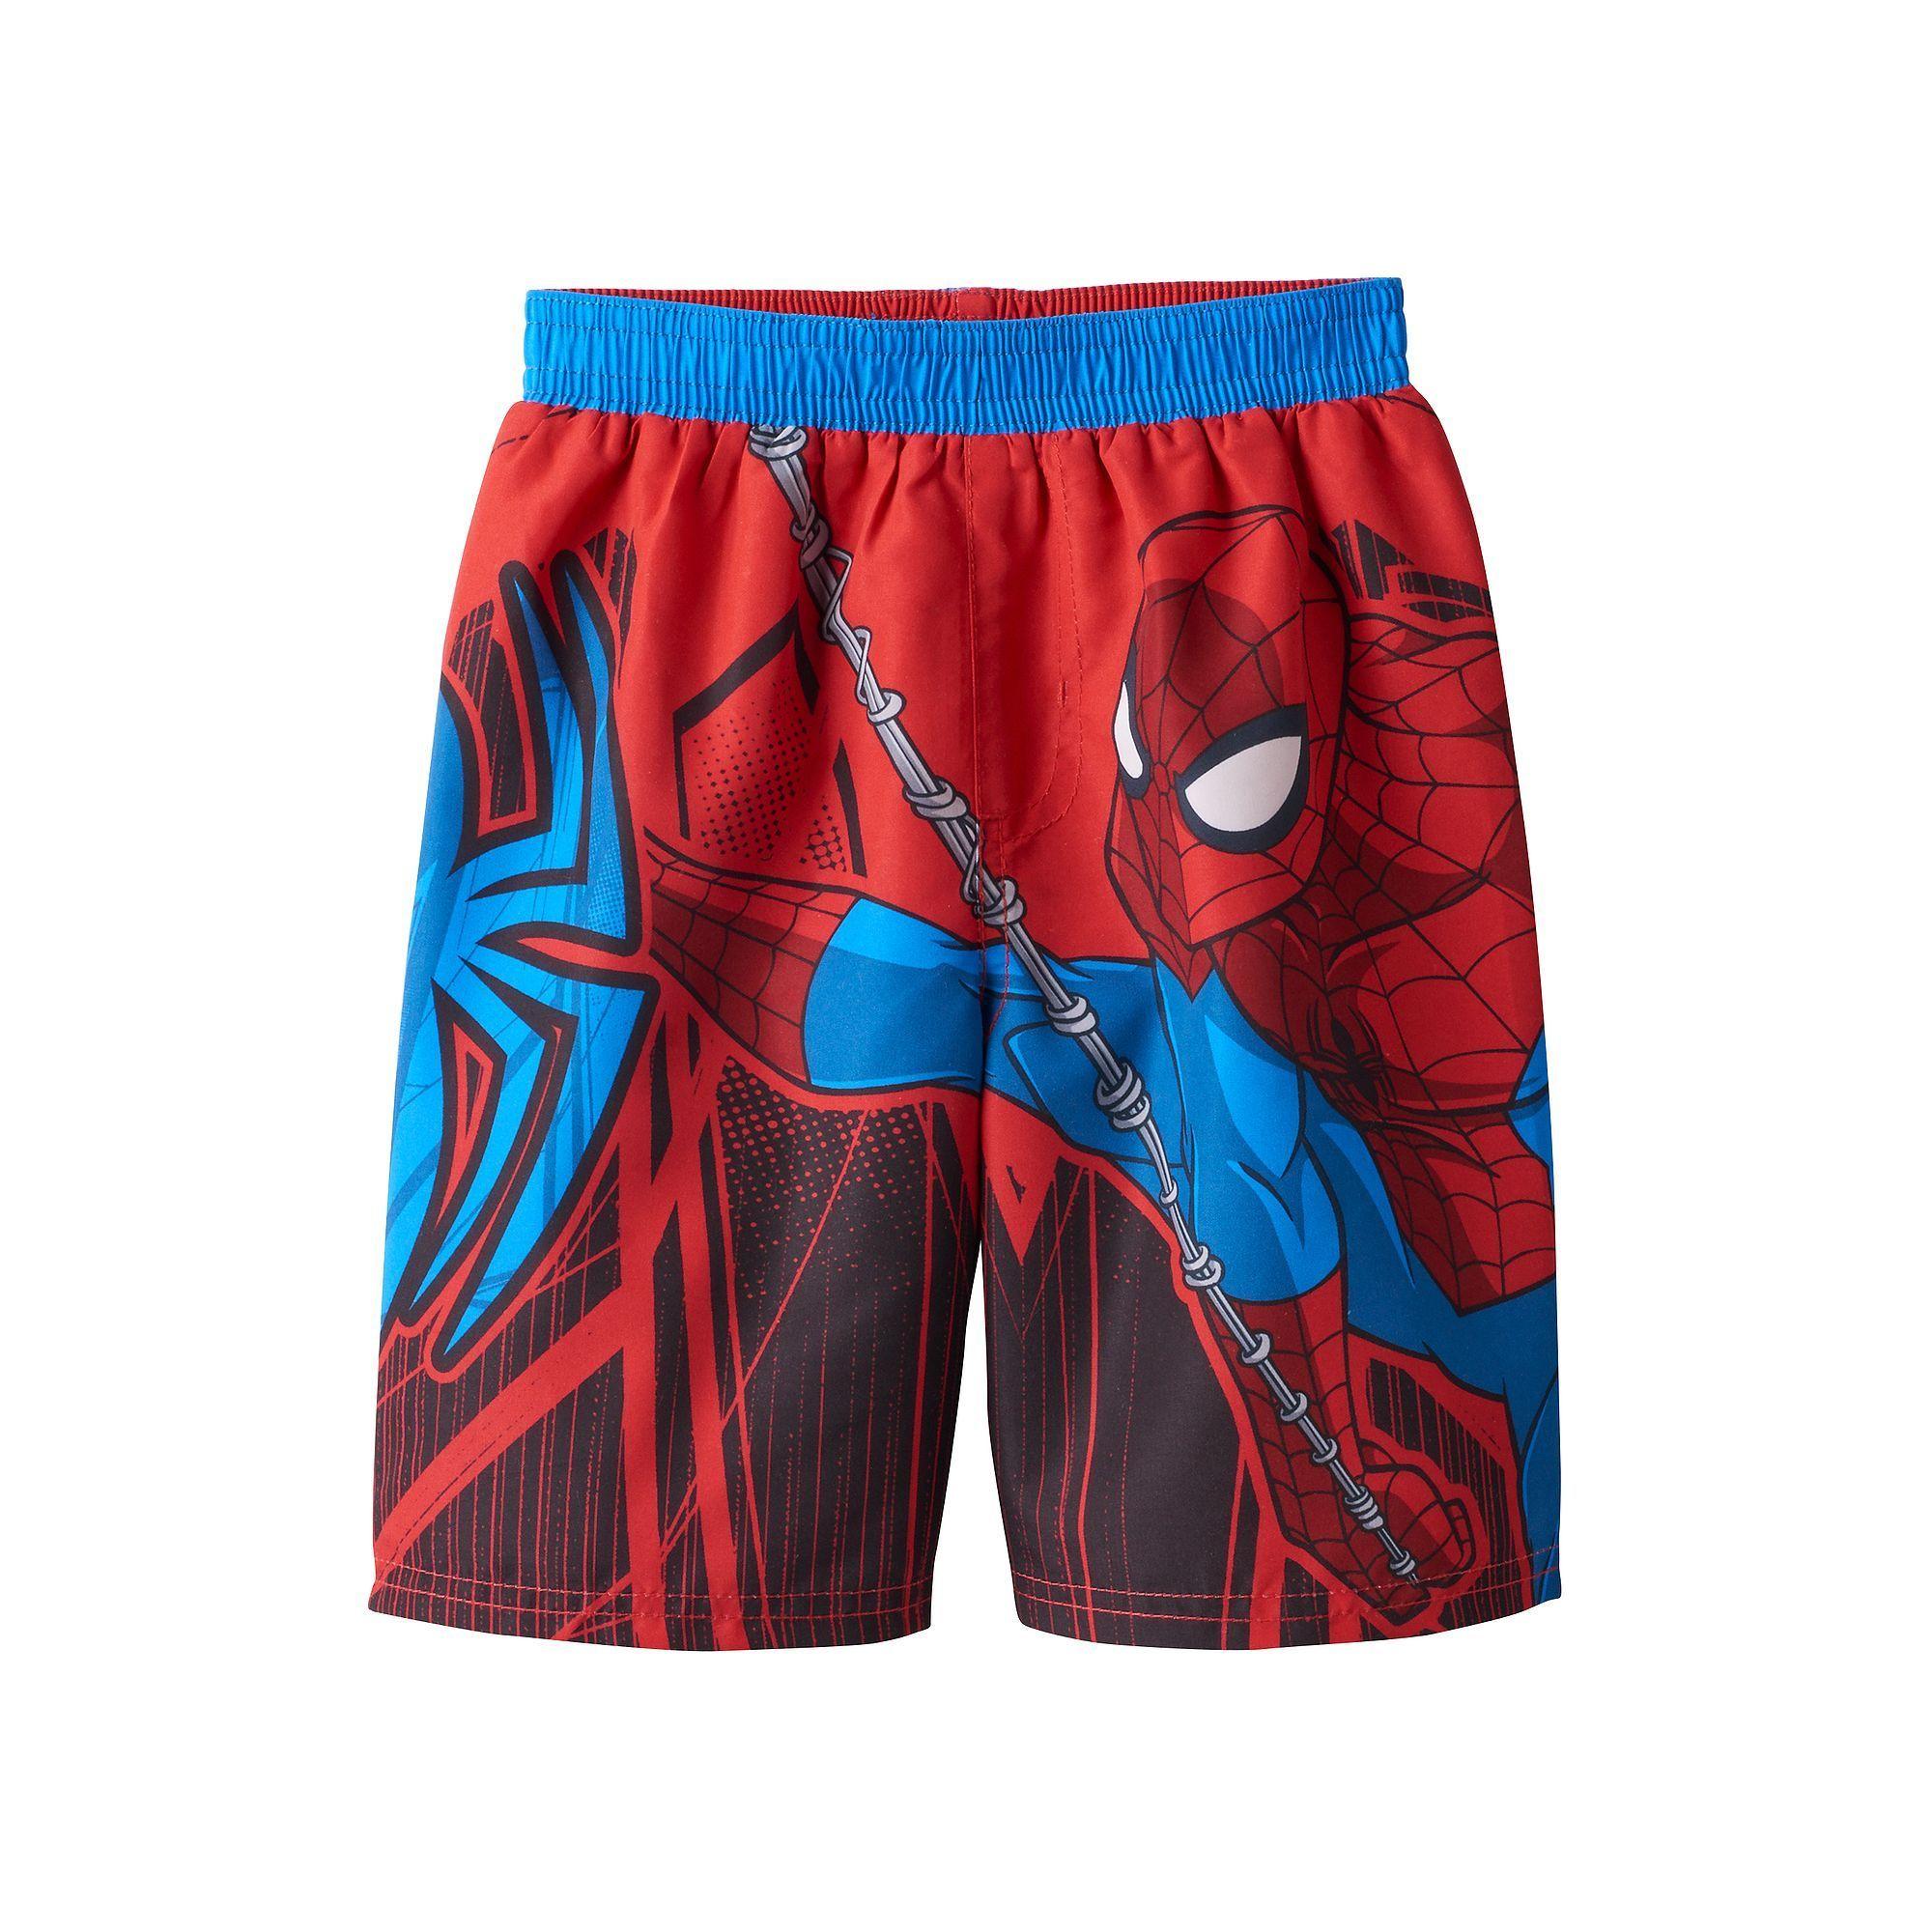 9da0bd6ebd Toddler Boy Marvel Spider-Man Swim Trunks | Products | Man swimming ...